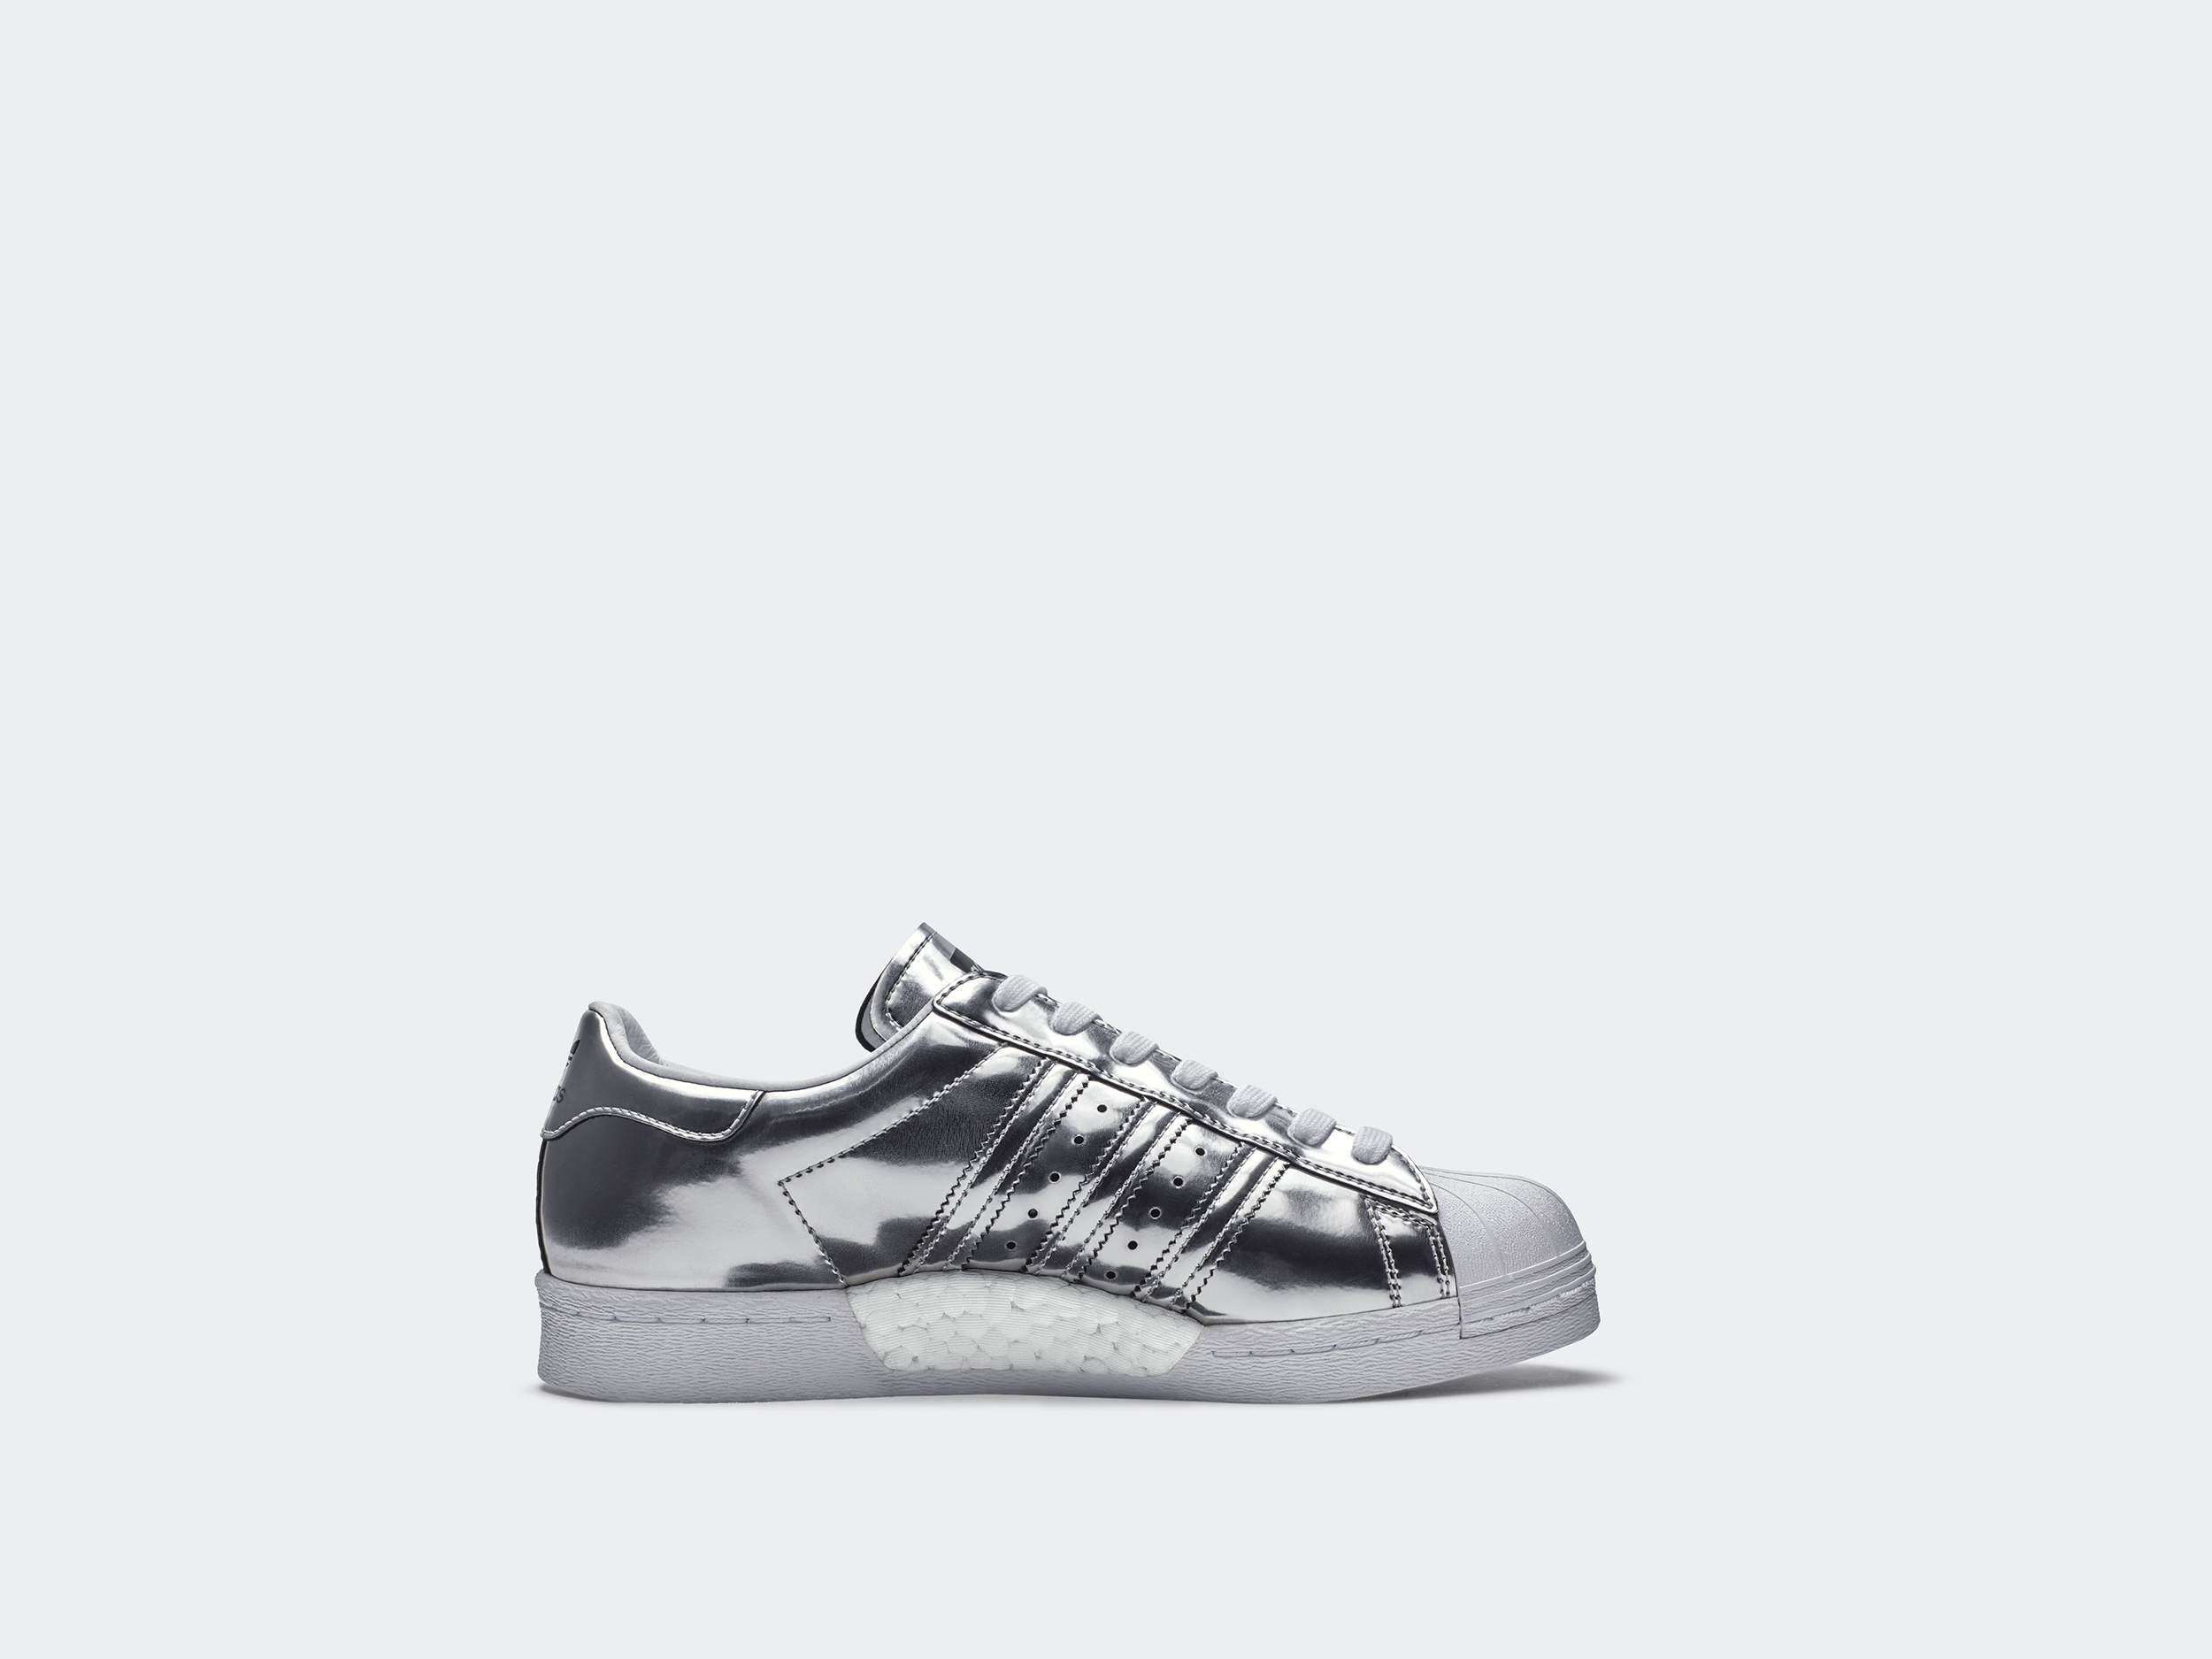 adidas Originals_Superstar with BOOST (3)